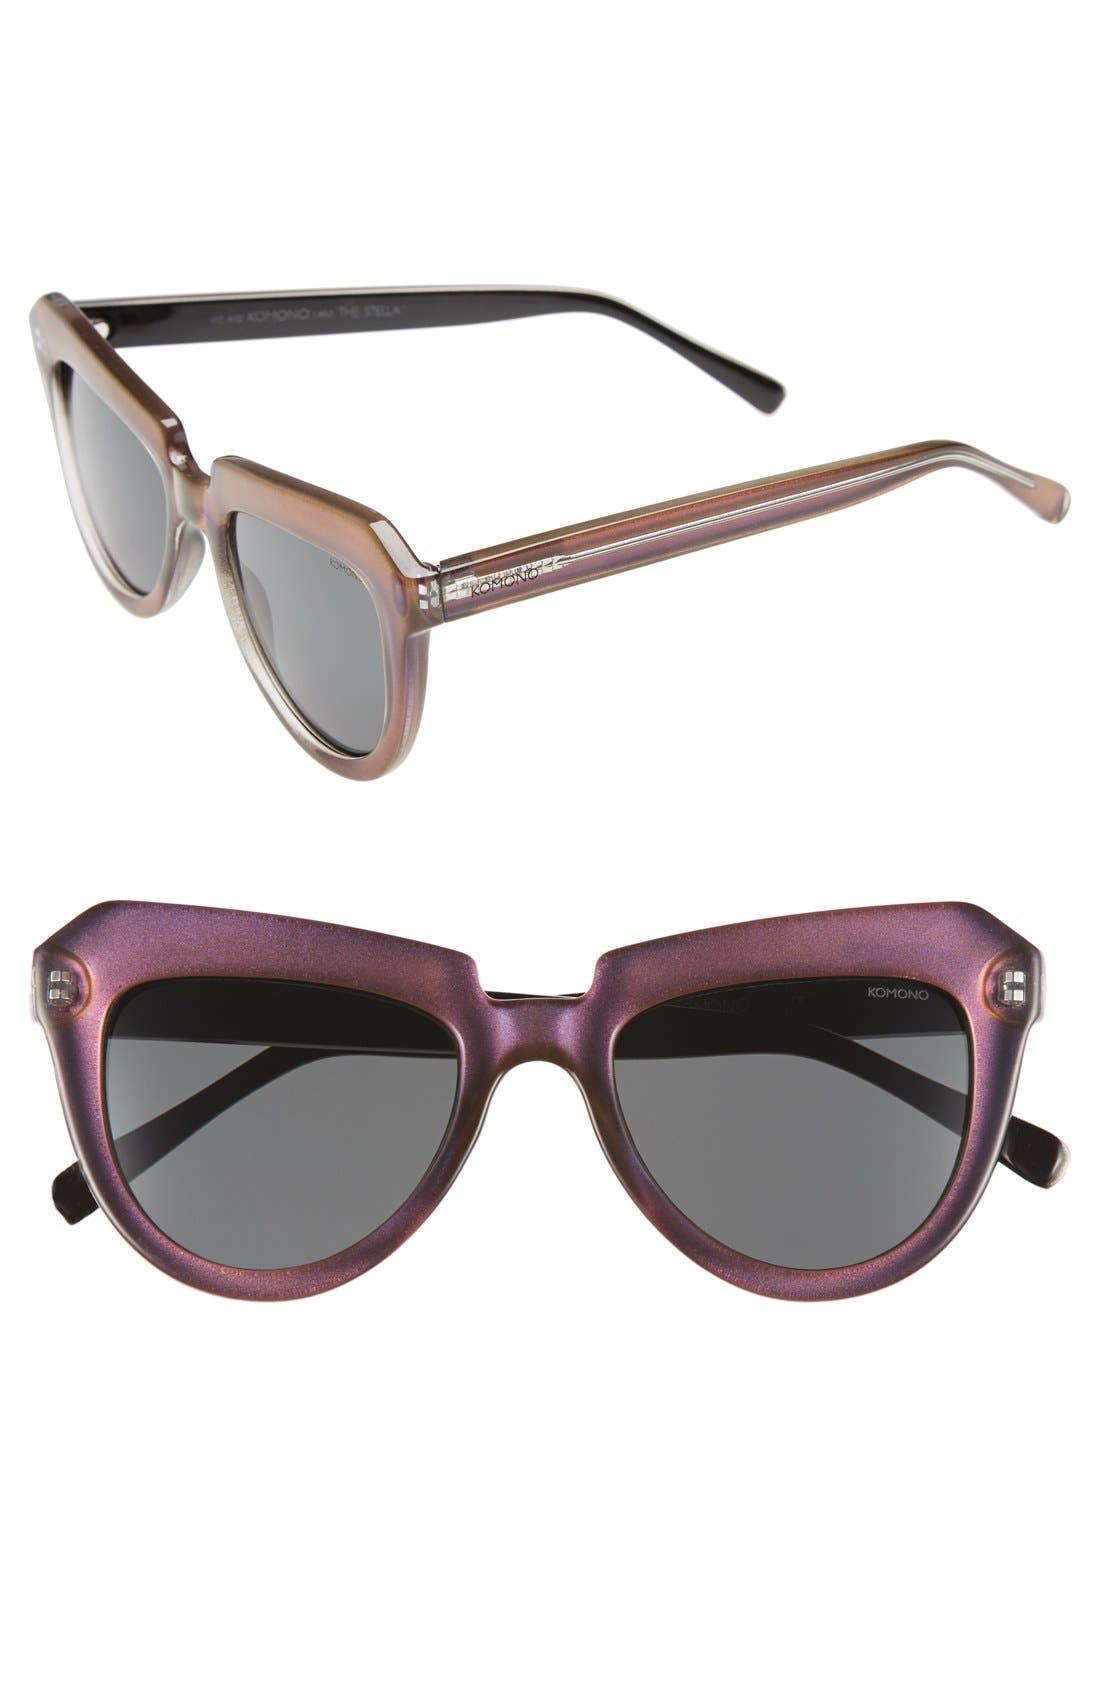 Main Image - Komono 'Stella' Sunglasses